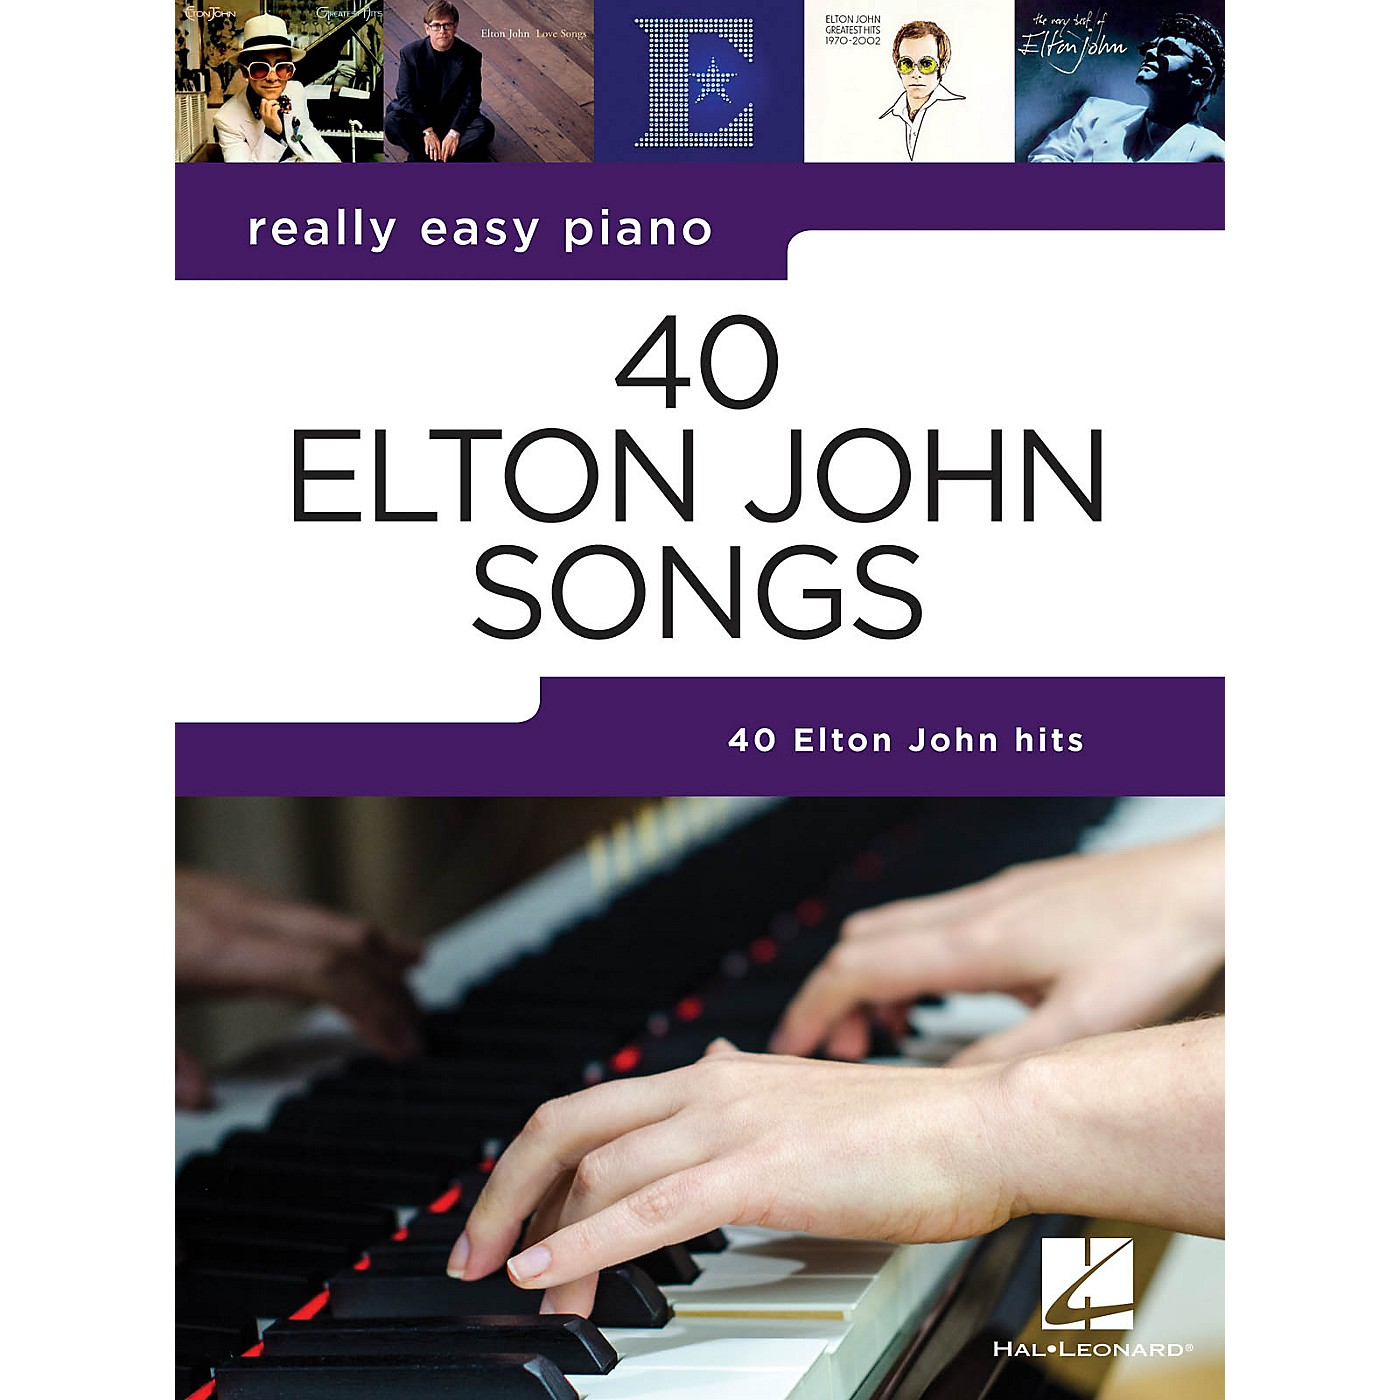 Hal Leonard 40 Elton John Songs (Really Easy Piano Series) Songbook thumbnail